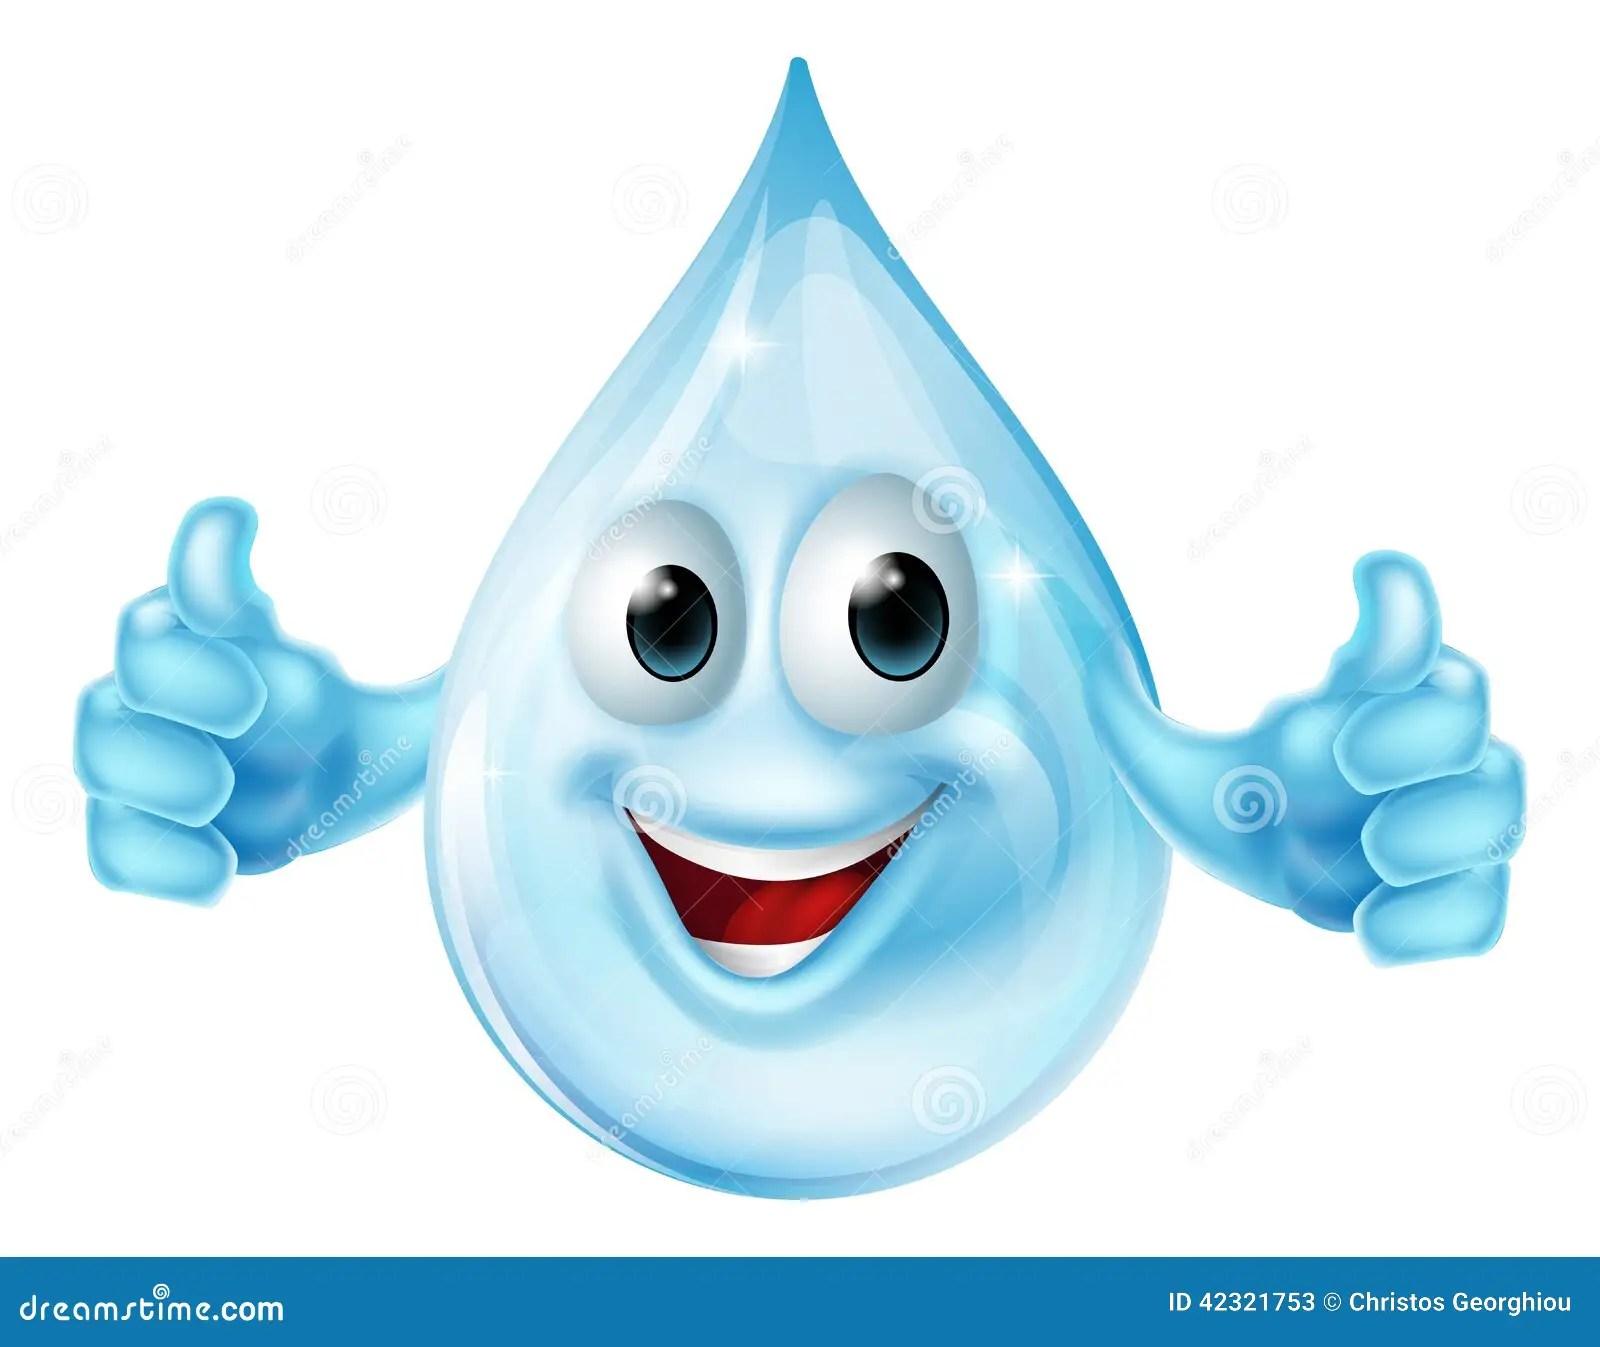 hight resolution of water drop mascot